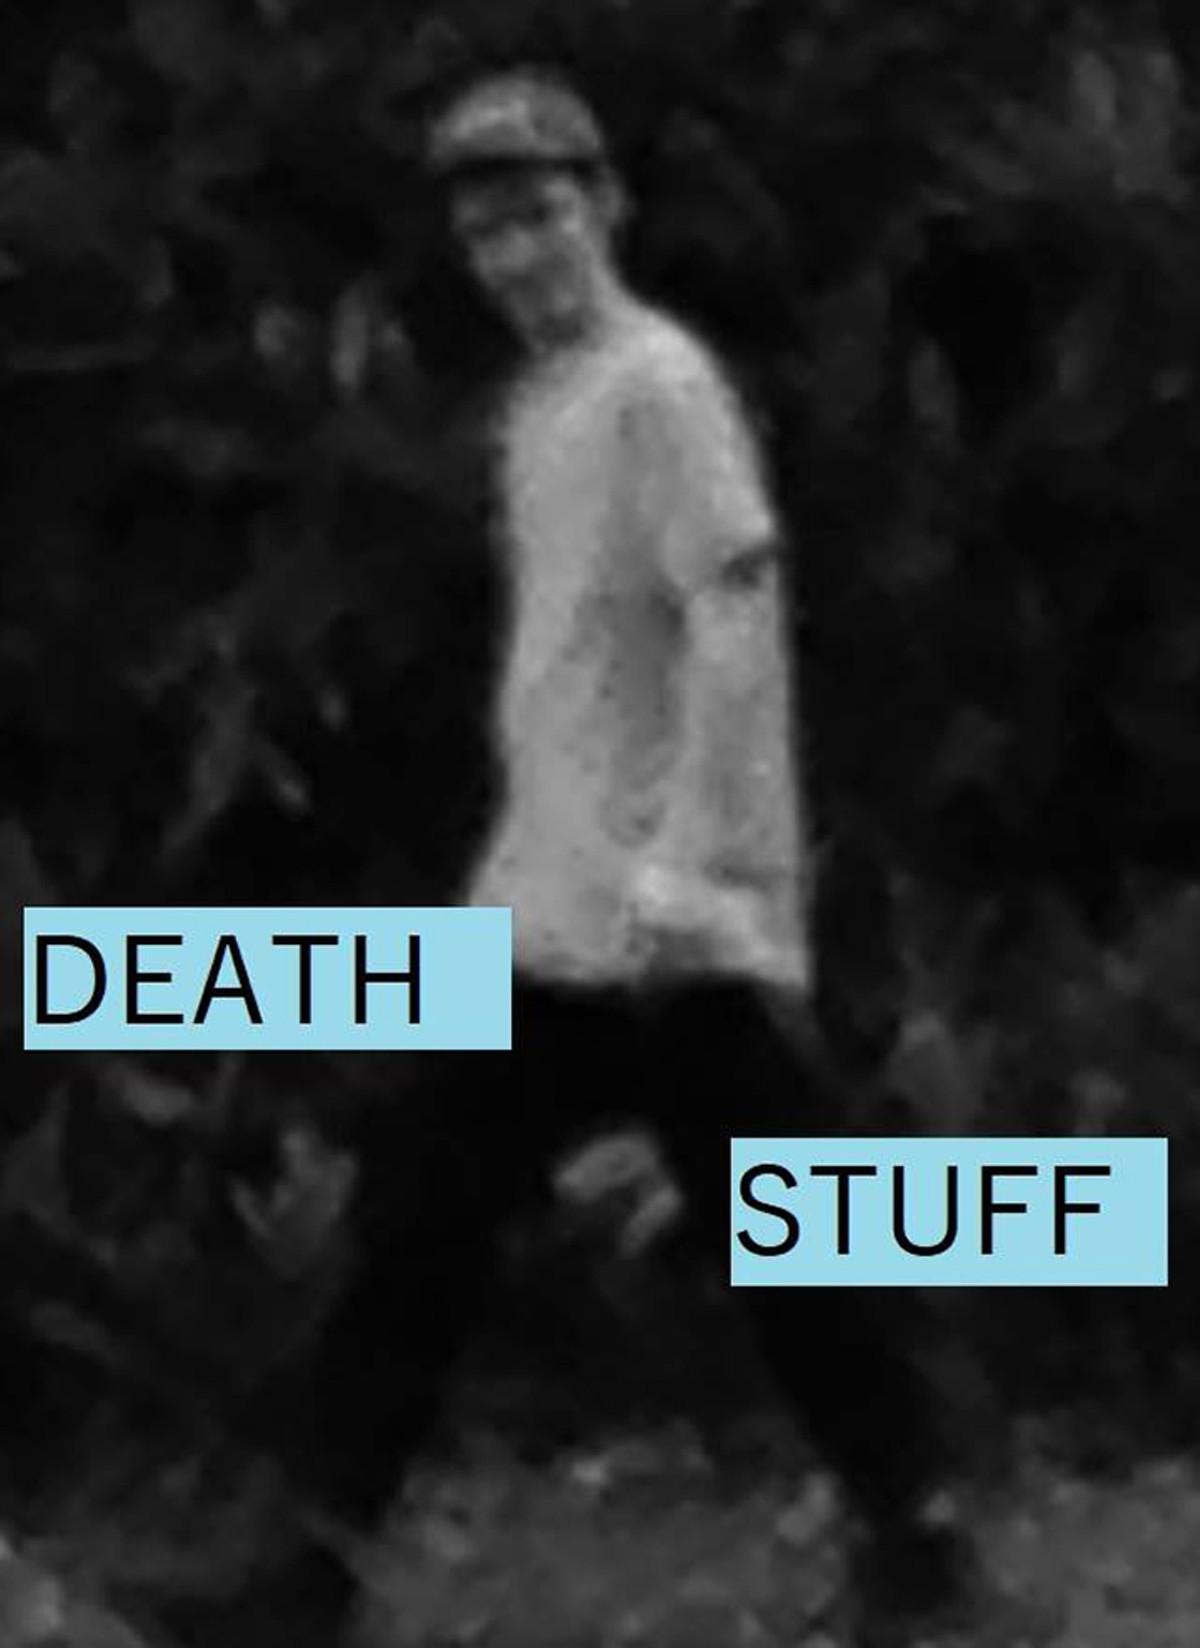 gal_death_stuff.jpg